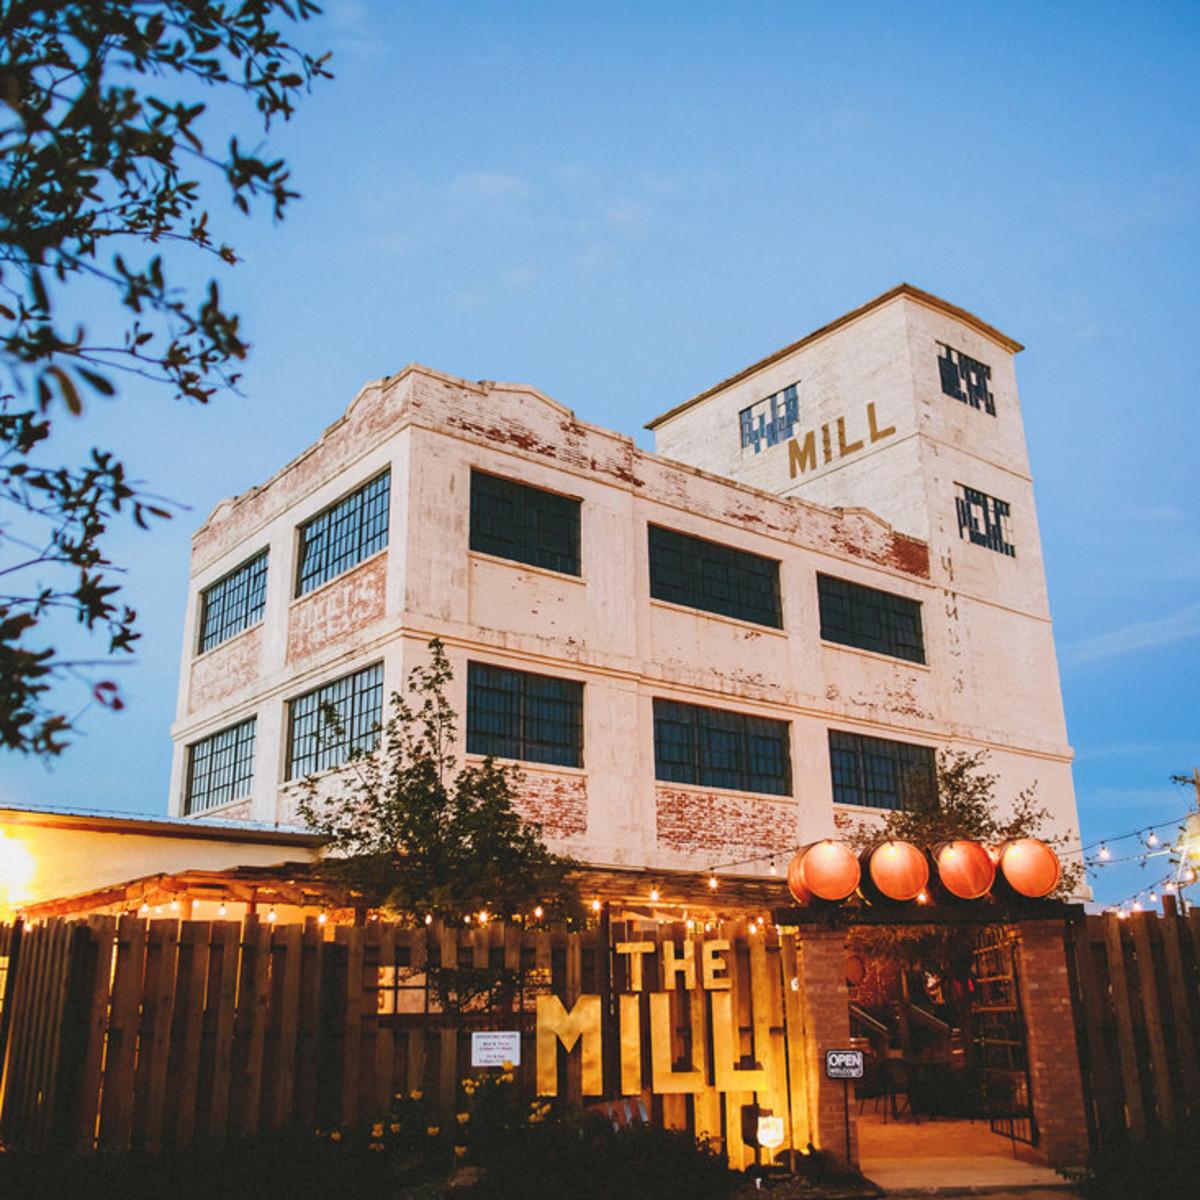 The Mill wine bar in Abilene, Texas